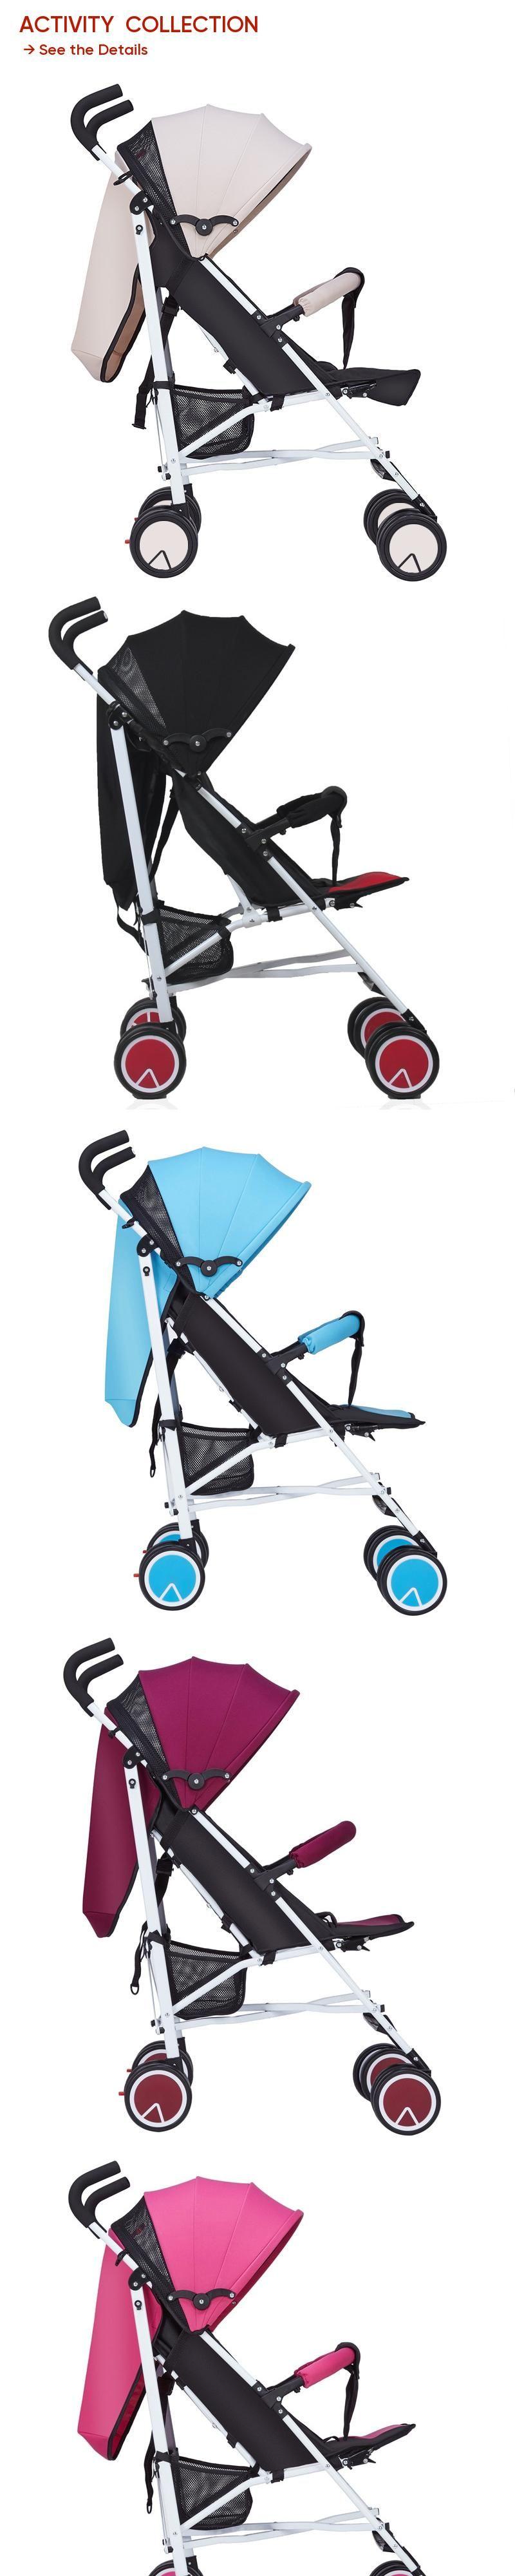 Kunbao Baby Stroller Portable Ultra Light Umbrella YOYA